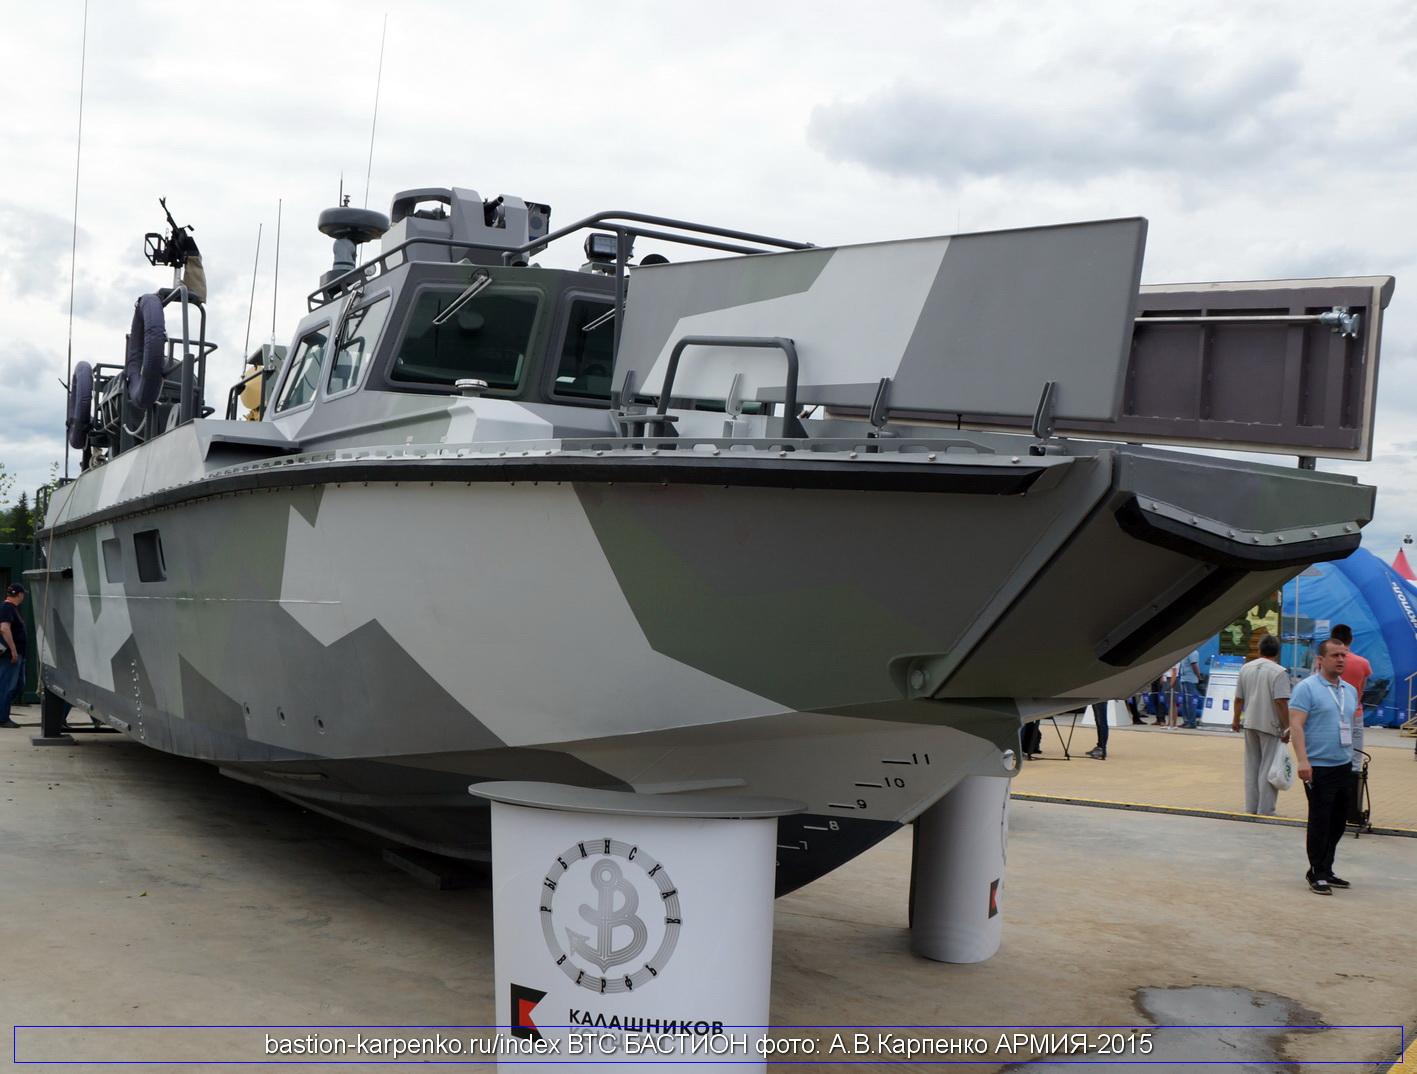 2015 Naval Show - St. Petersburg BK-16_ARMIY-2015_01